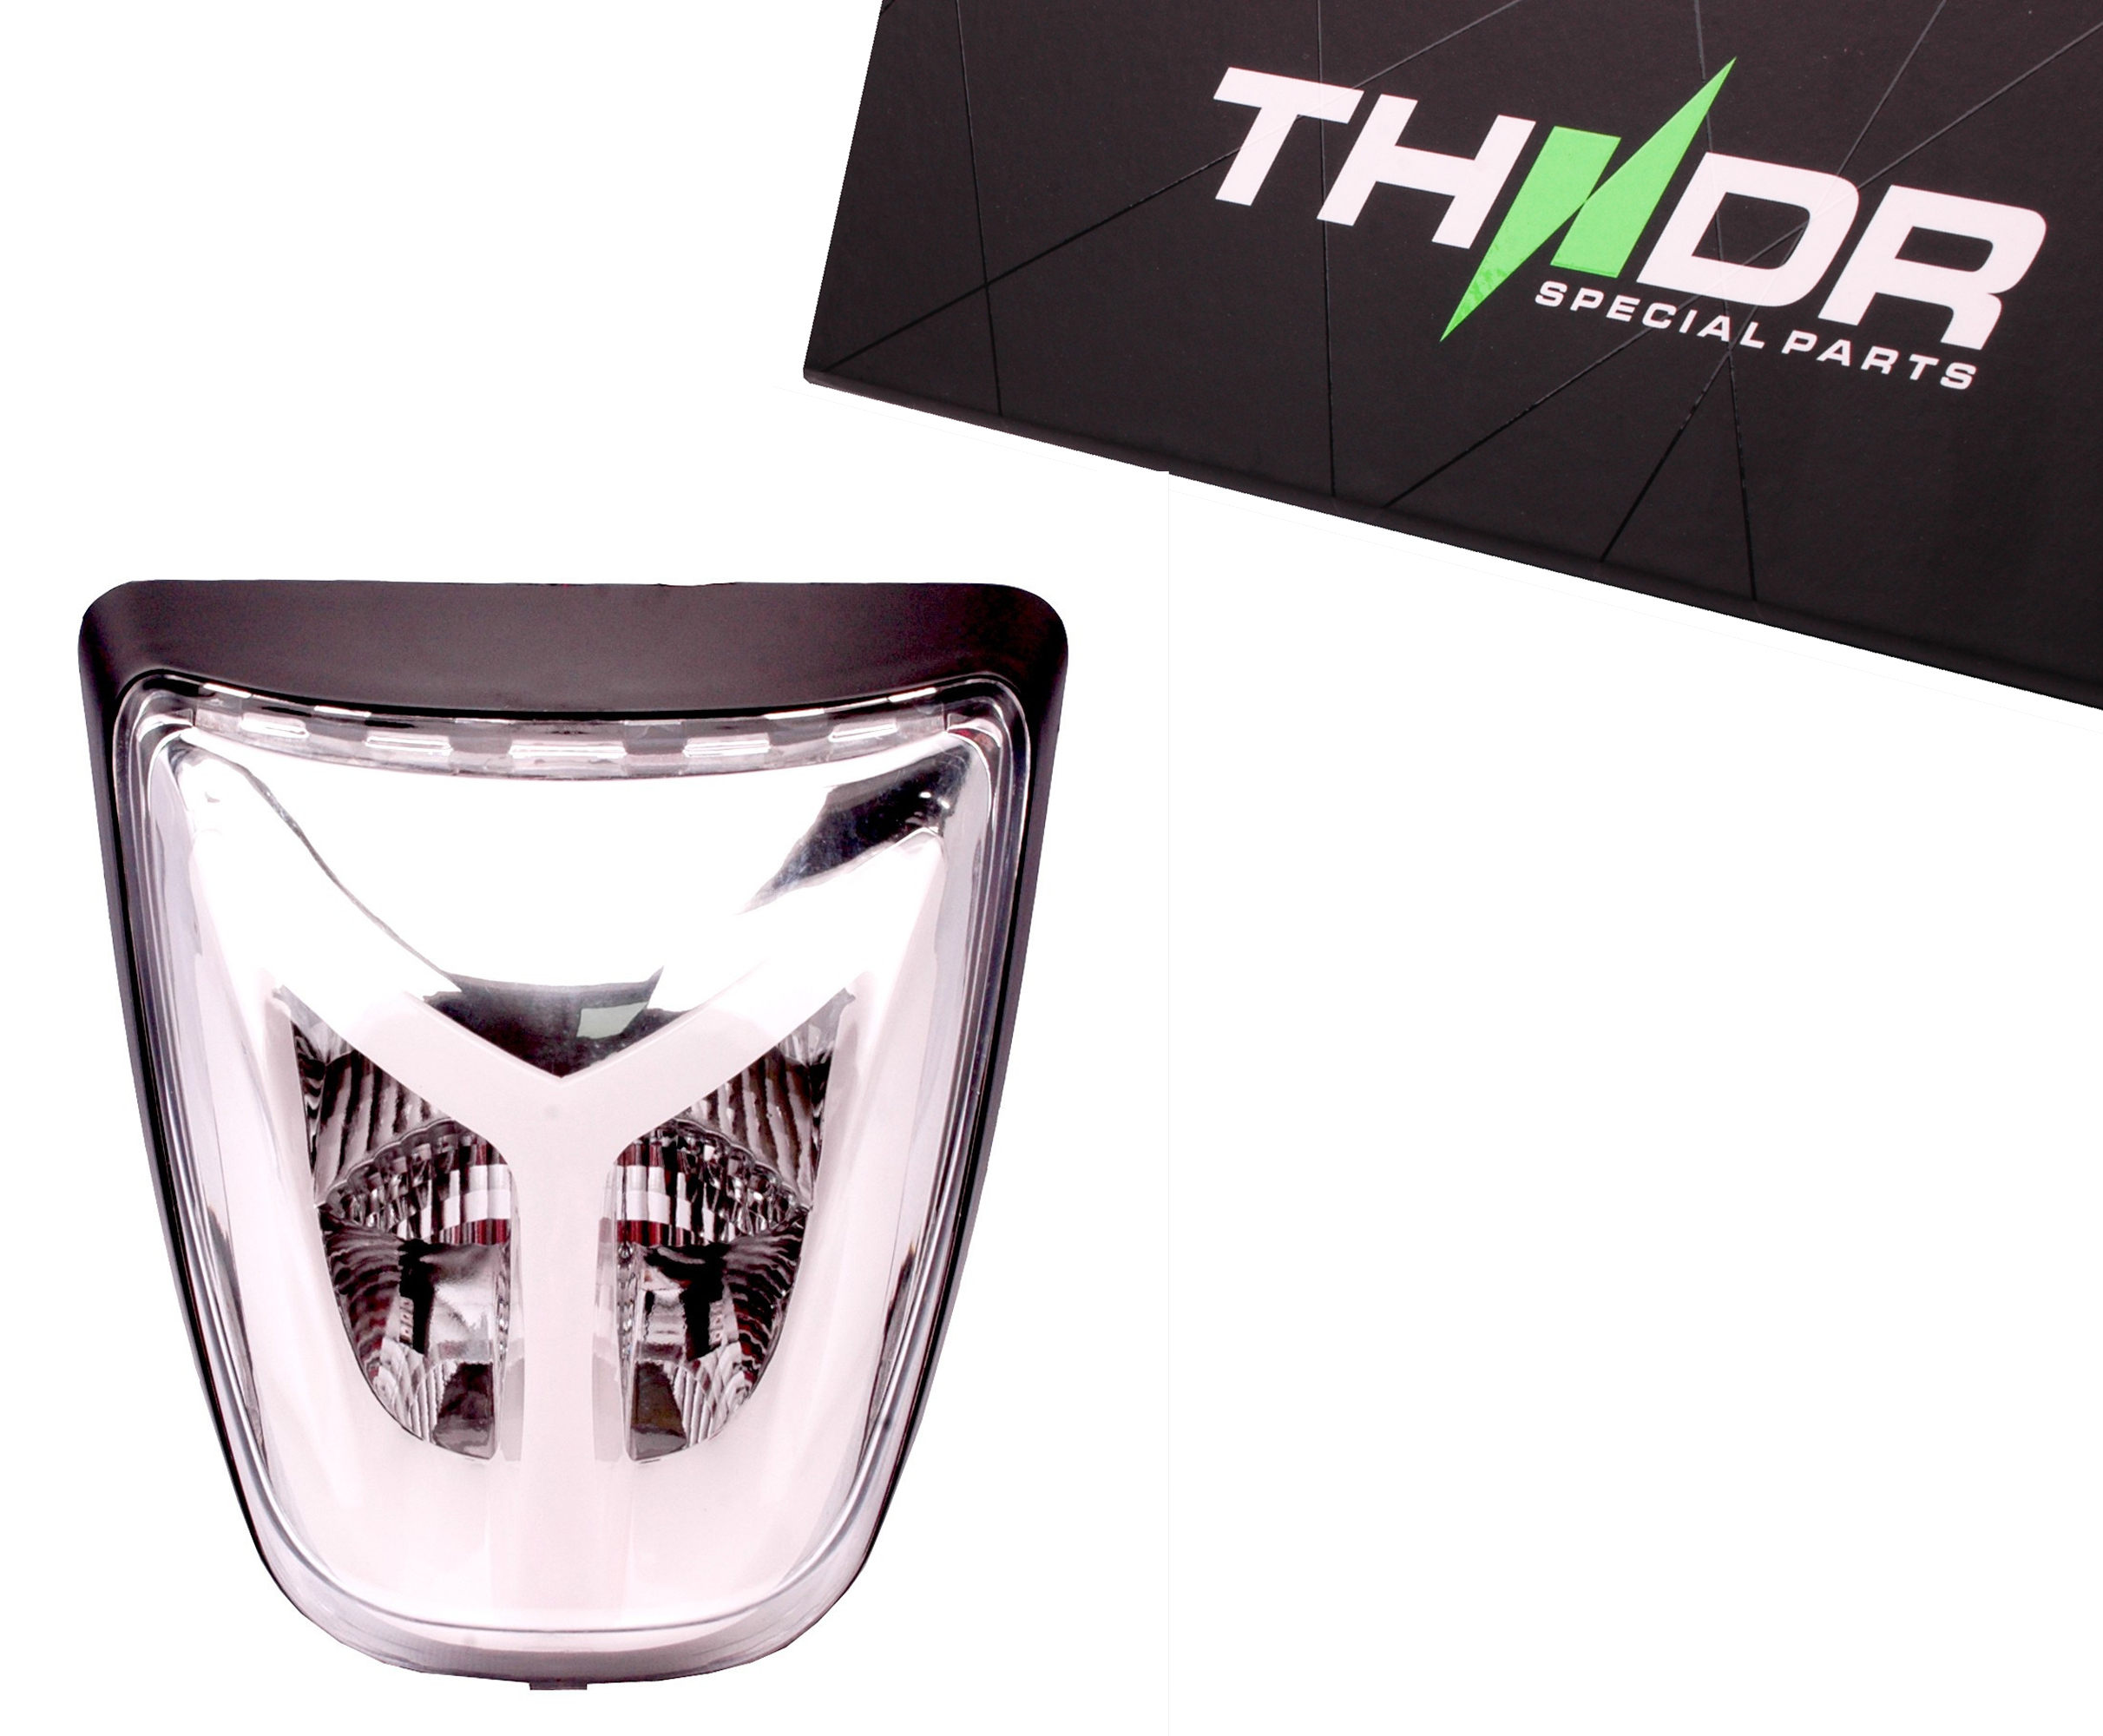 Achterlicht LED Tube THNDR Wit - Vespa Sprint